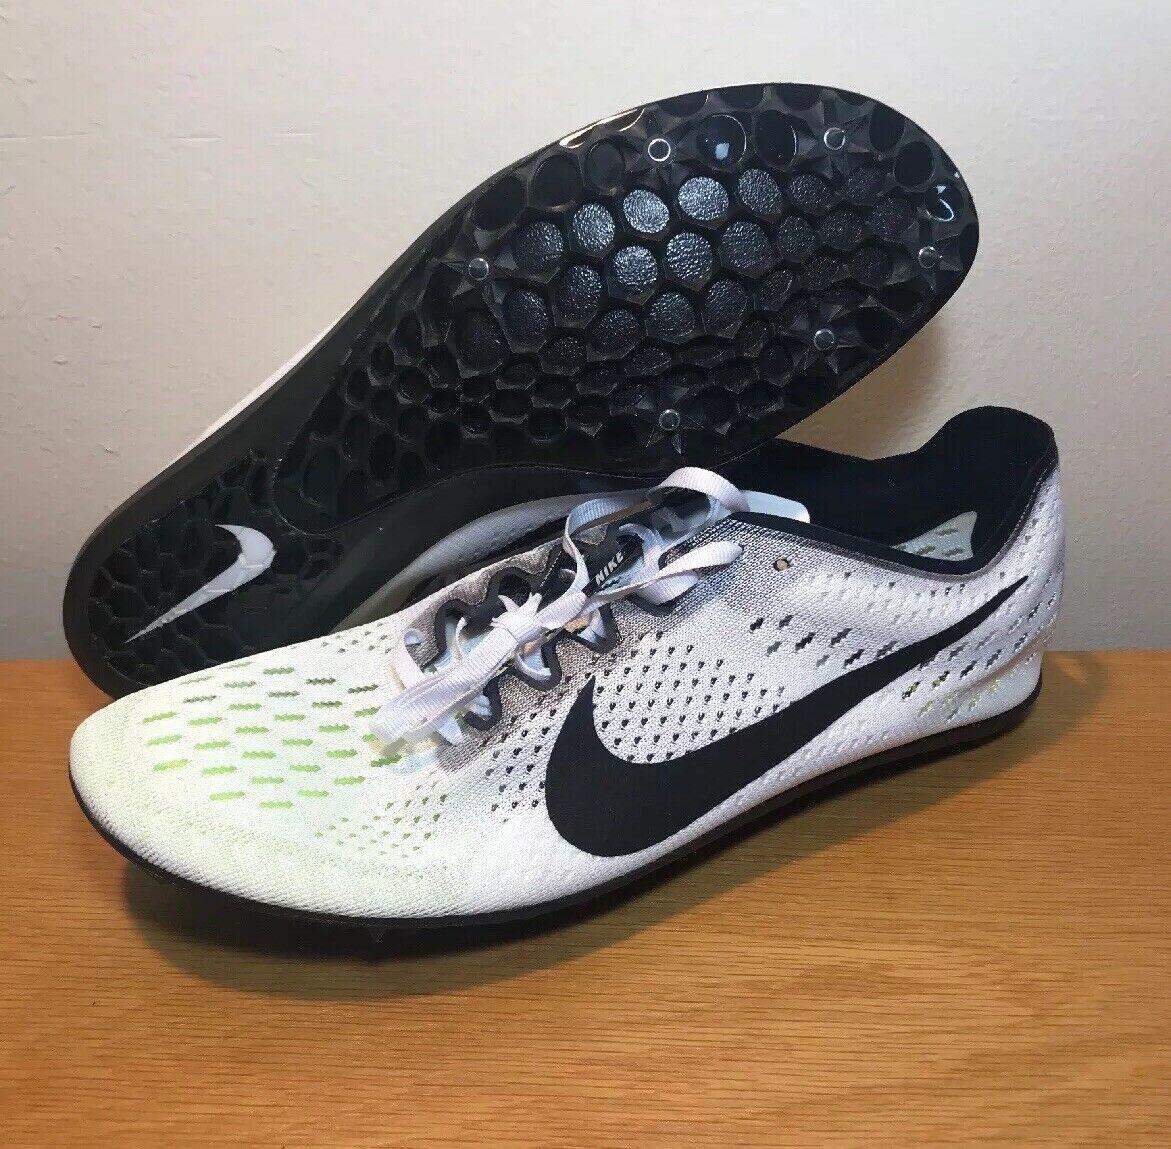 NEW Nike Zoom Victory Elite 2 2 2 Track Racing Spikes Sz 12.5 Black White 835998-107 b62f58